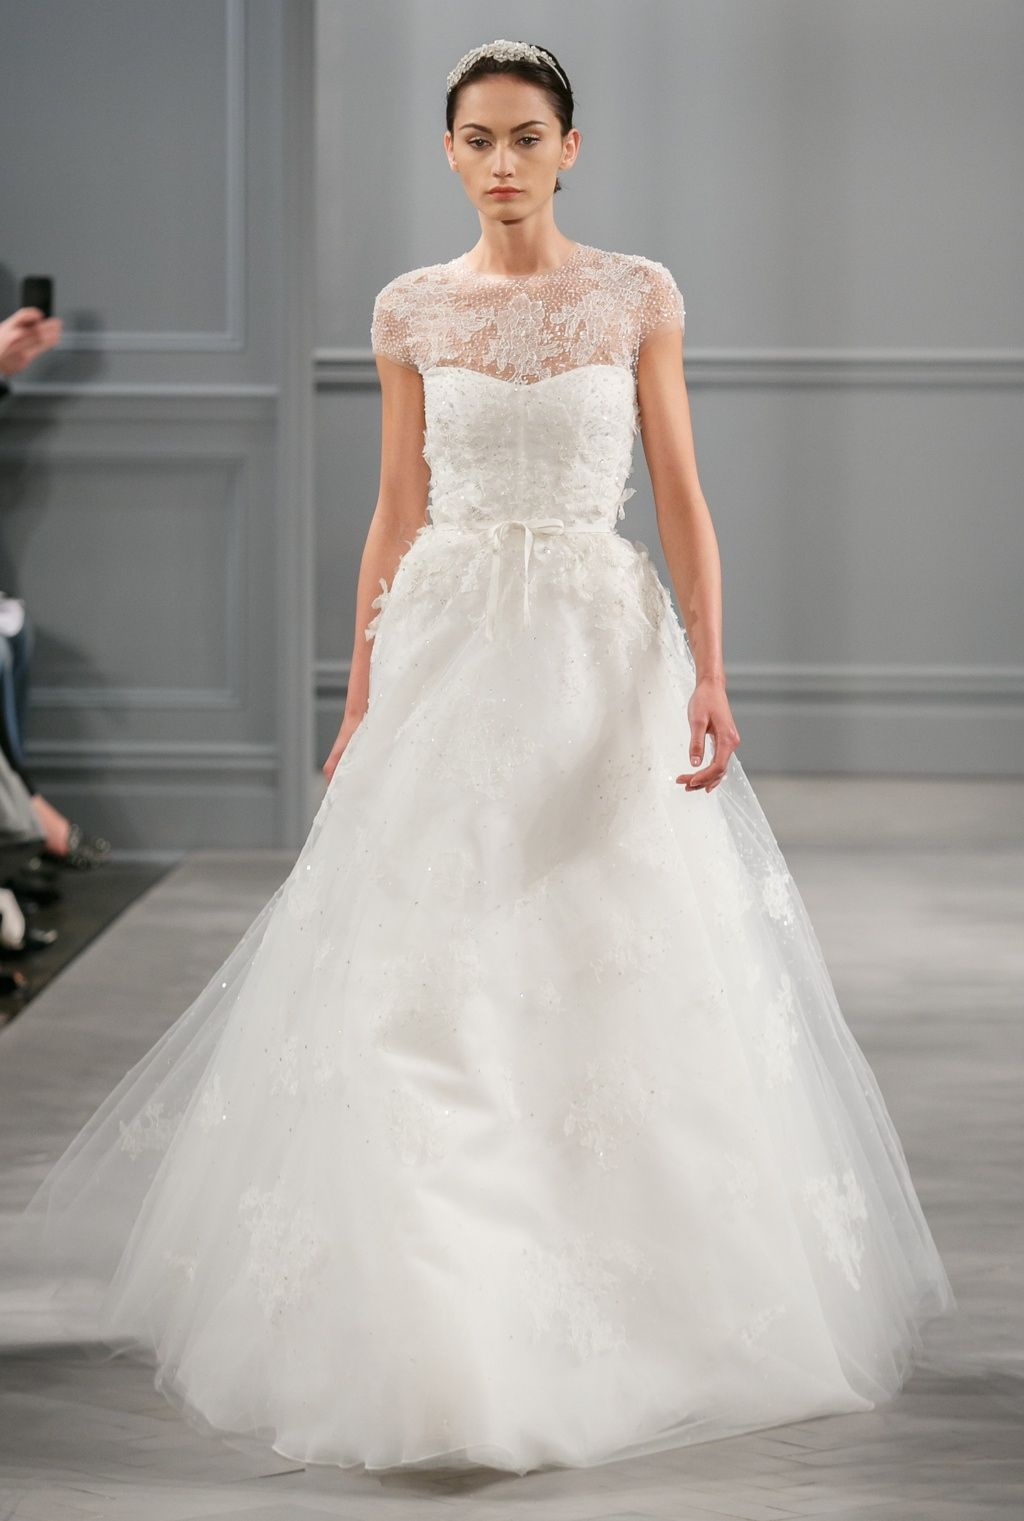 Monique Lhuillier Wedding Dresses Prices - Dresses for Wedding ...